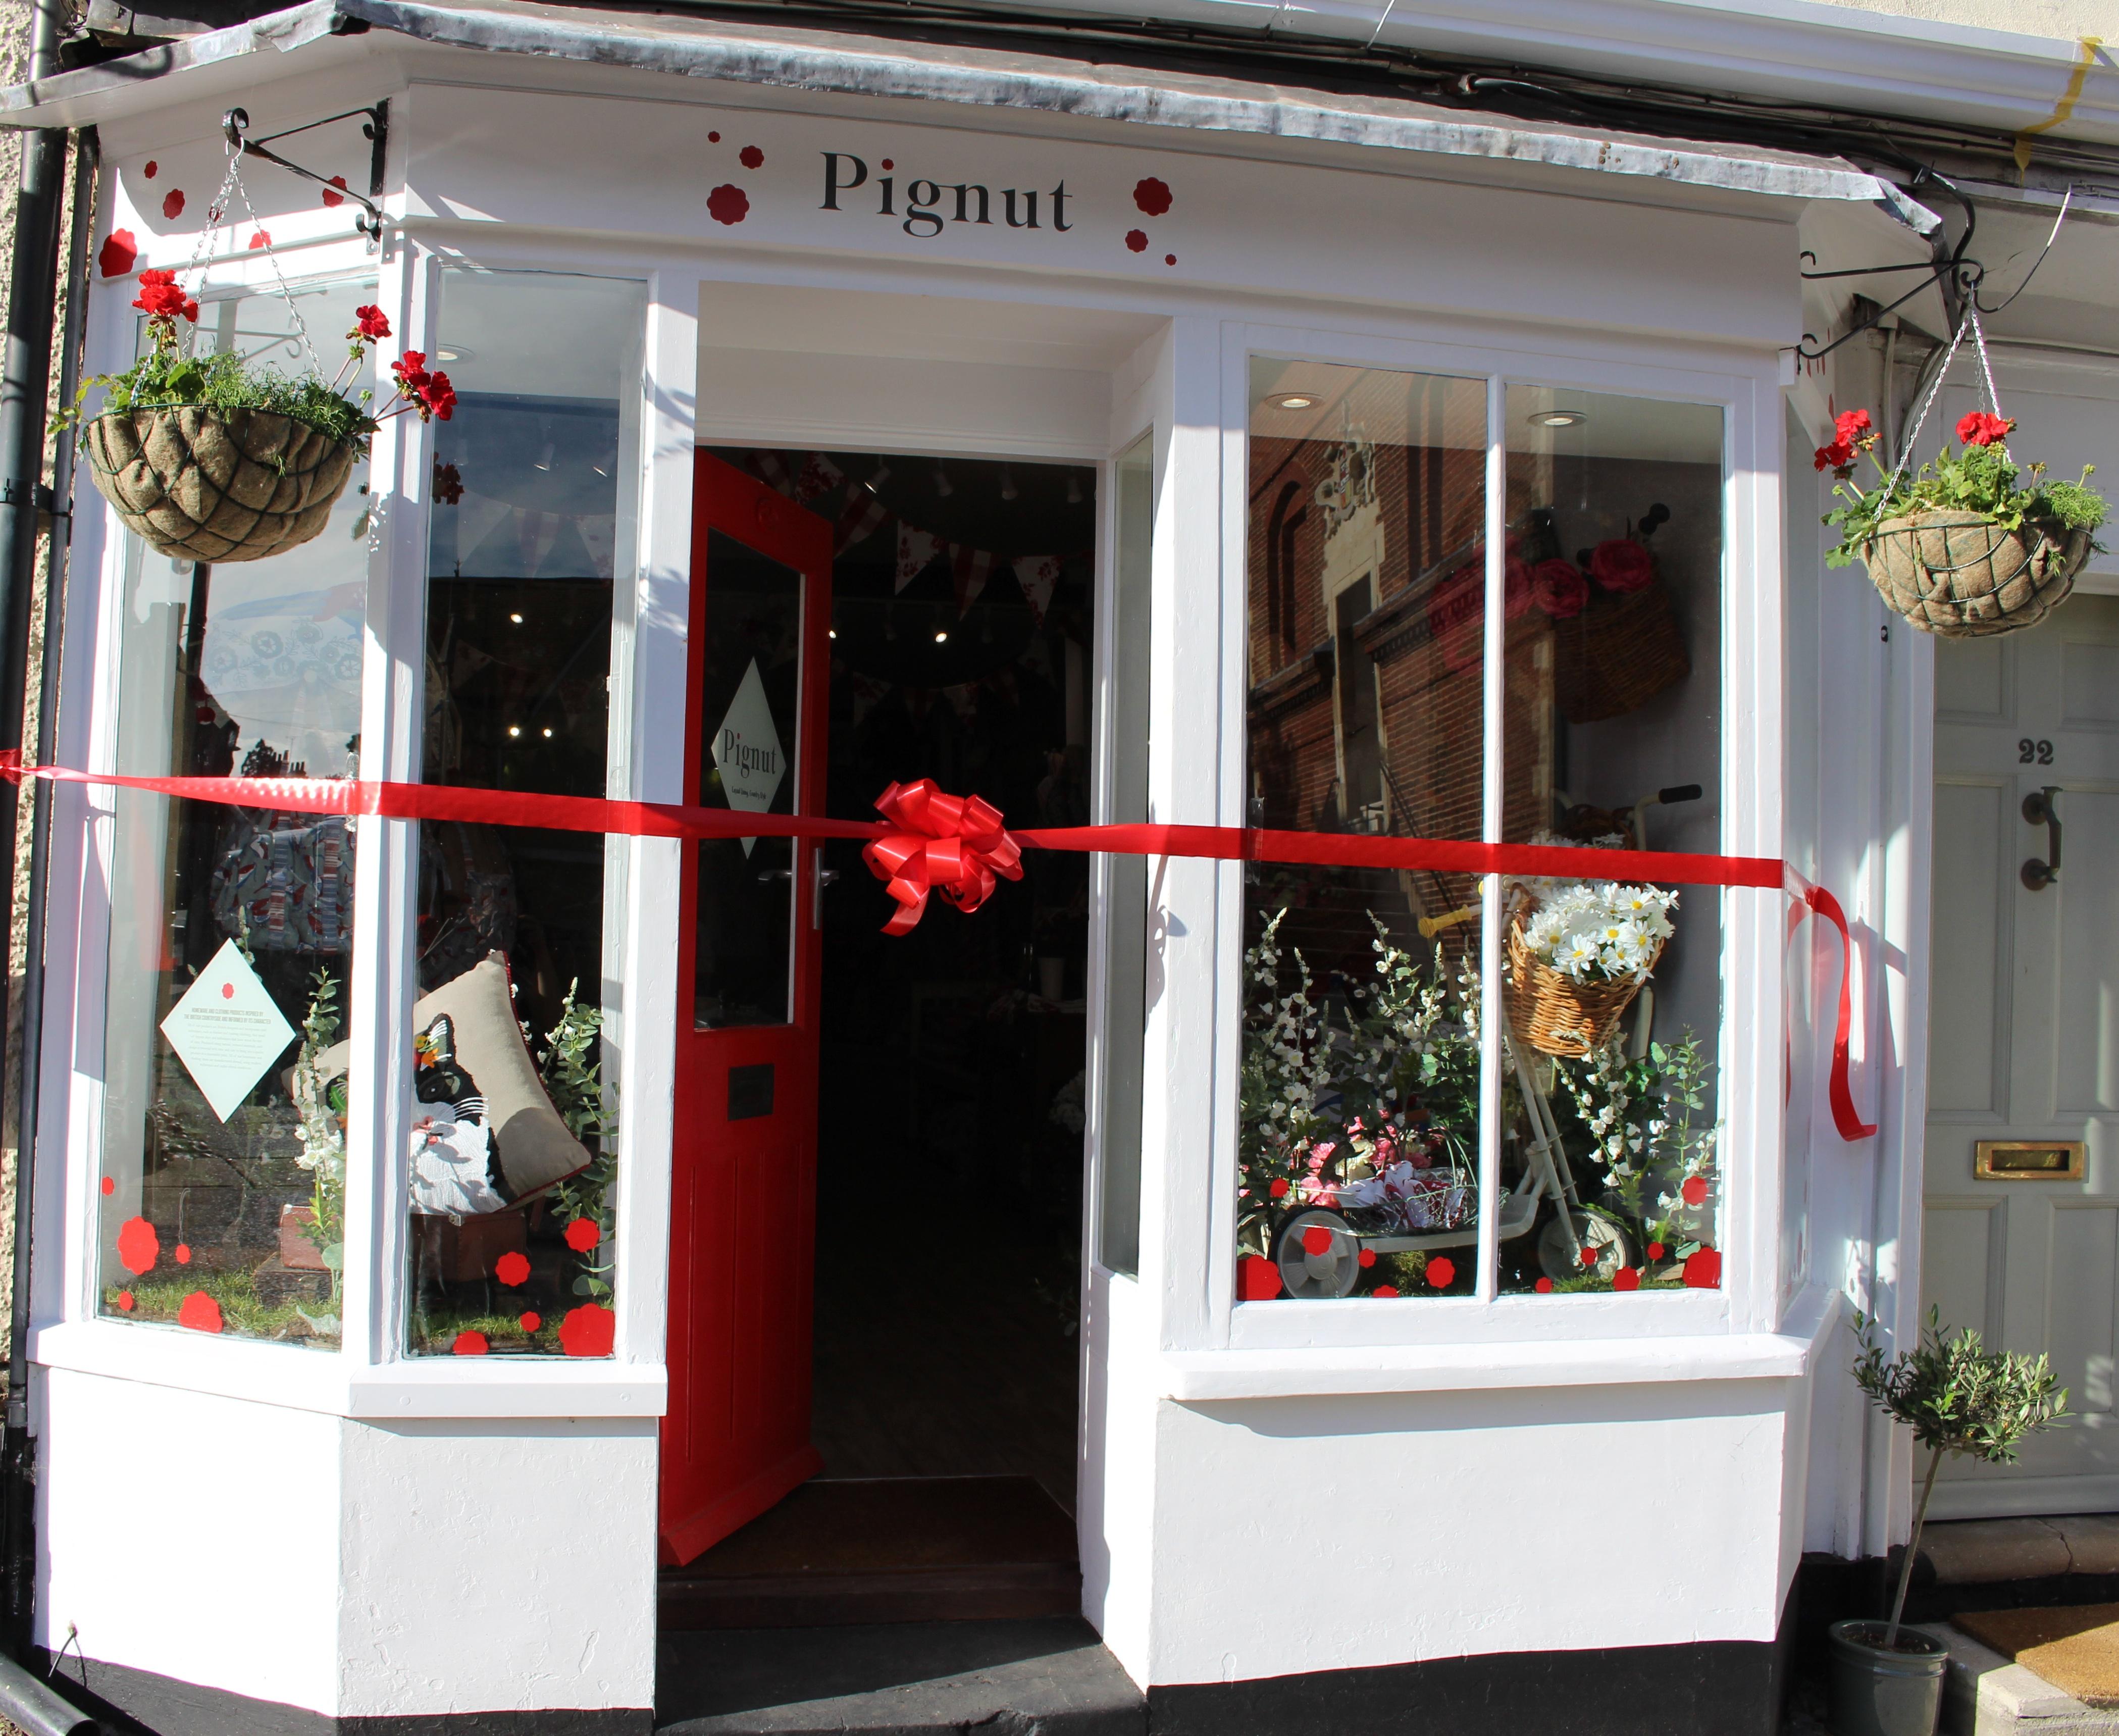 New Interior Store, Pignut, Opens In Woodbridge